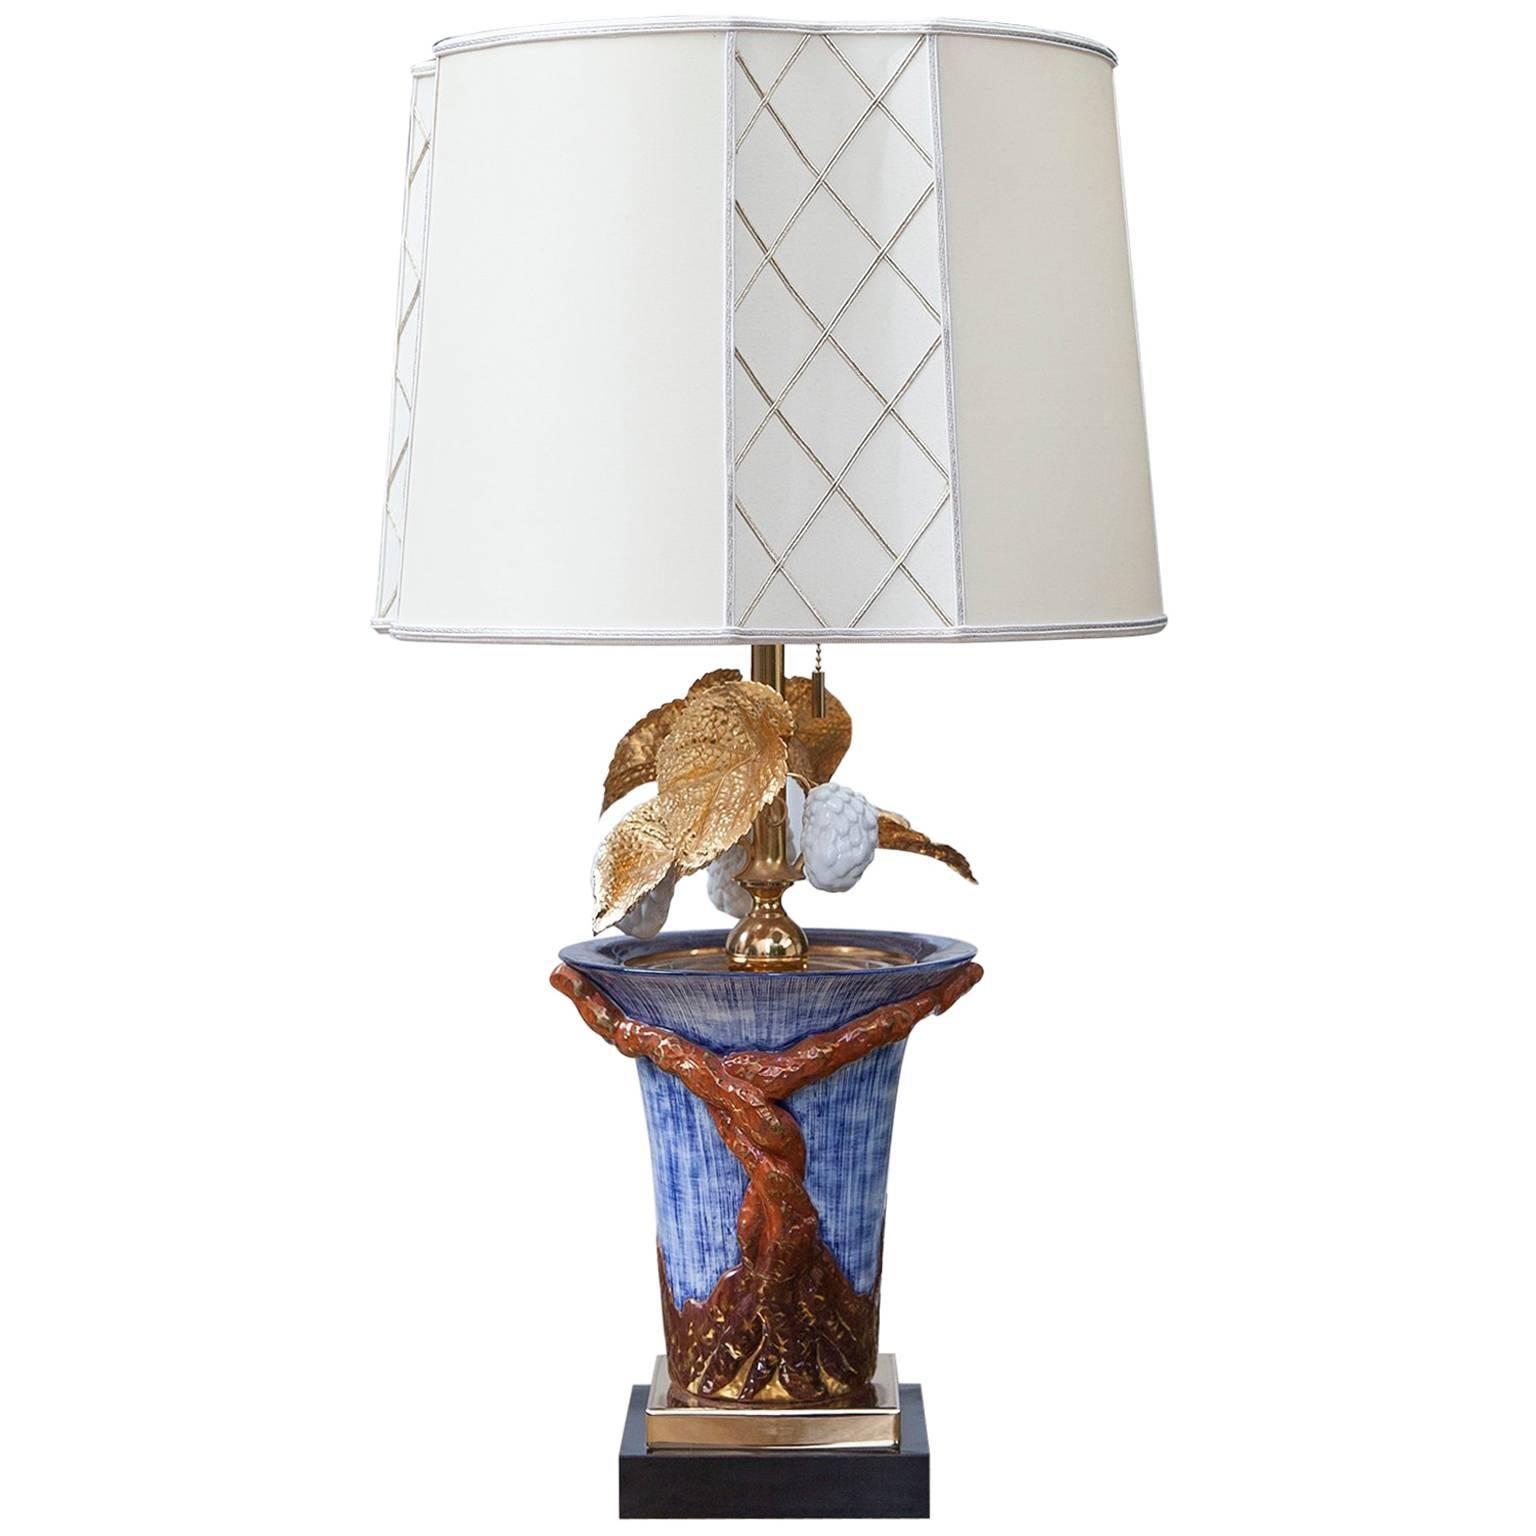 Colorful Porcelain Leaf Table Lamp